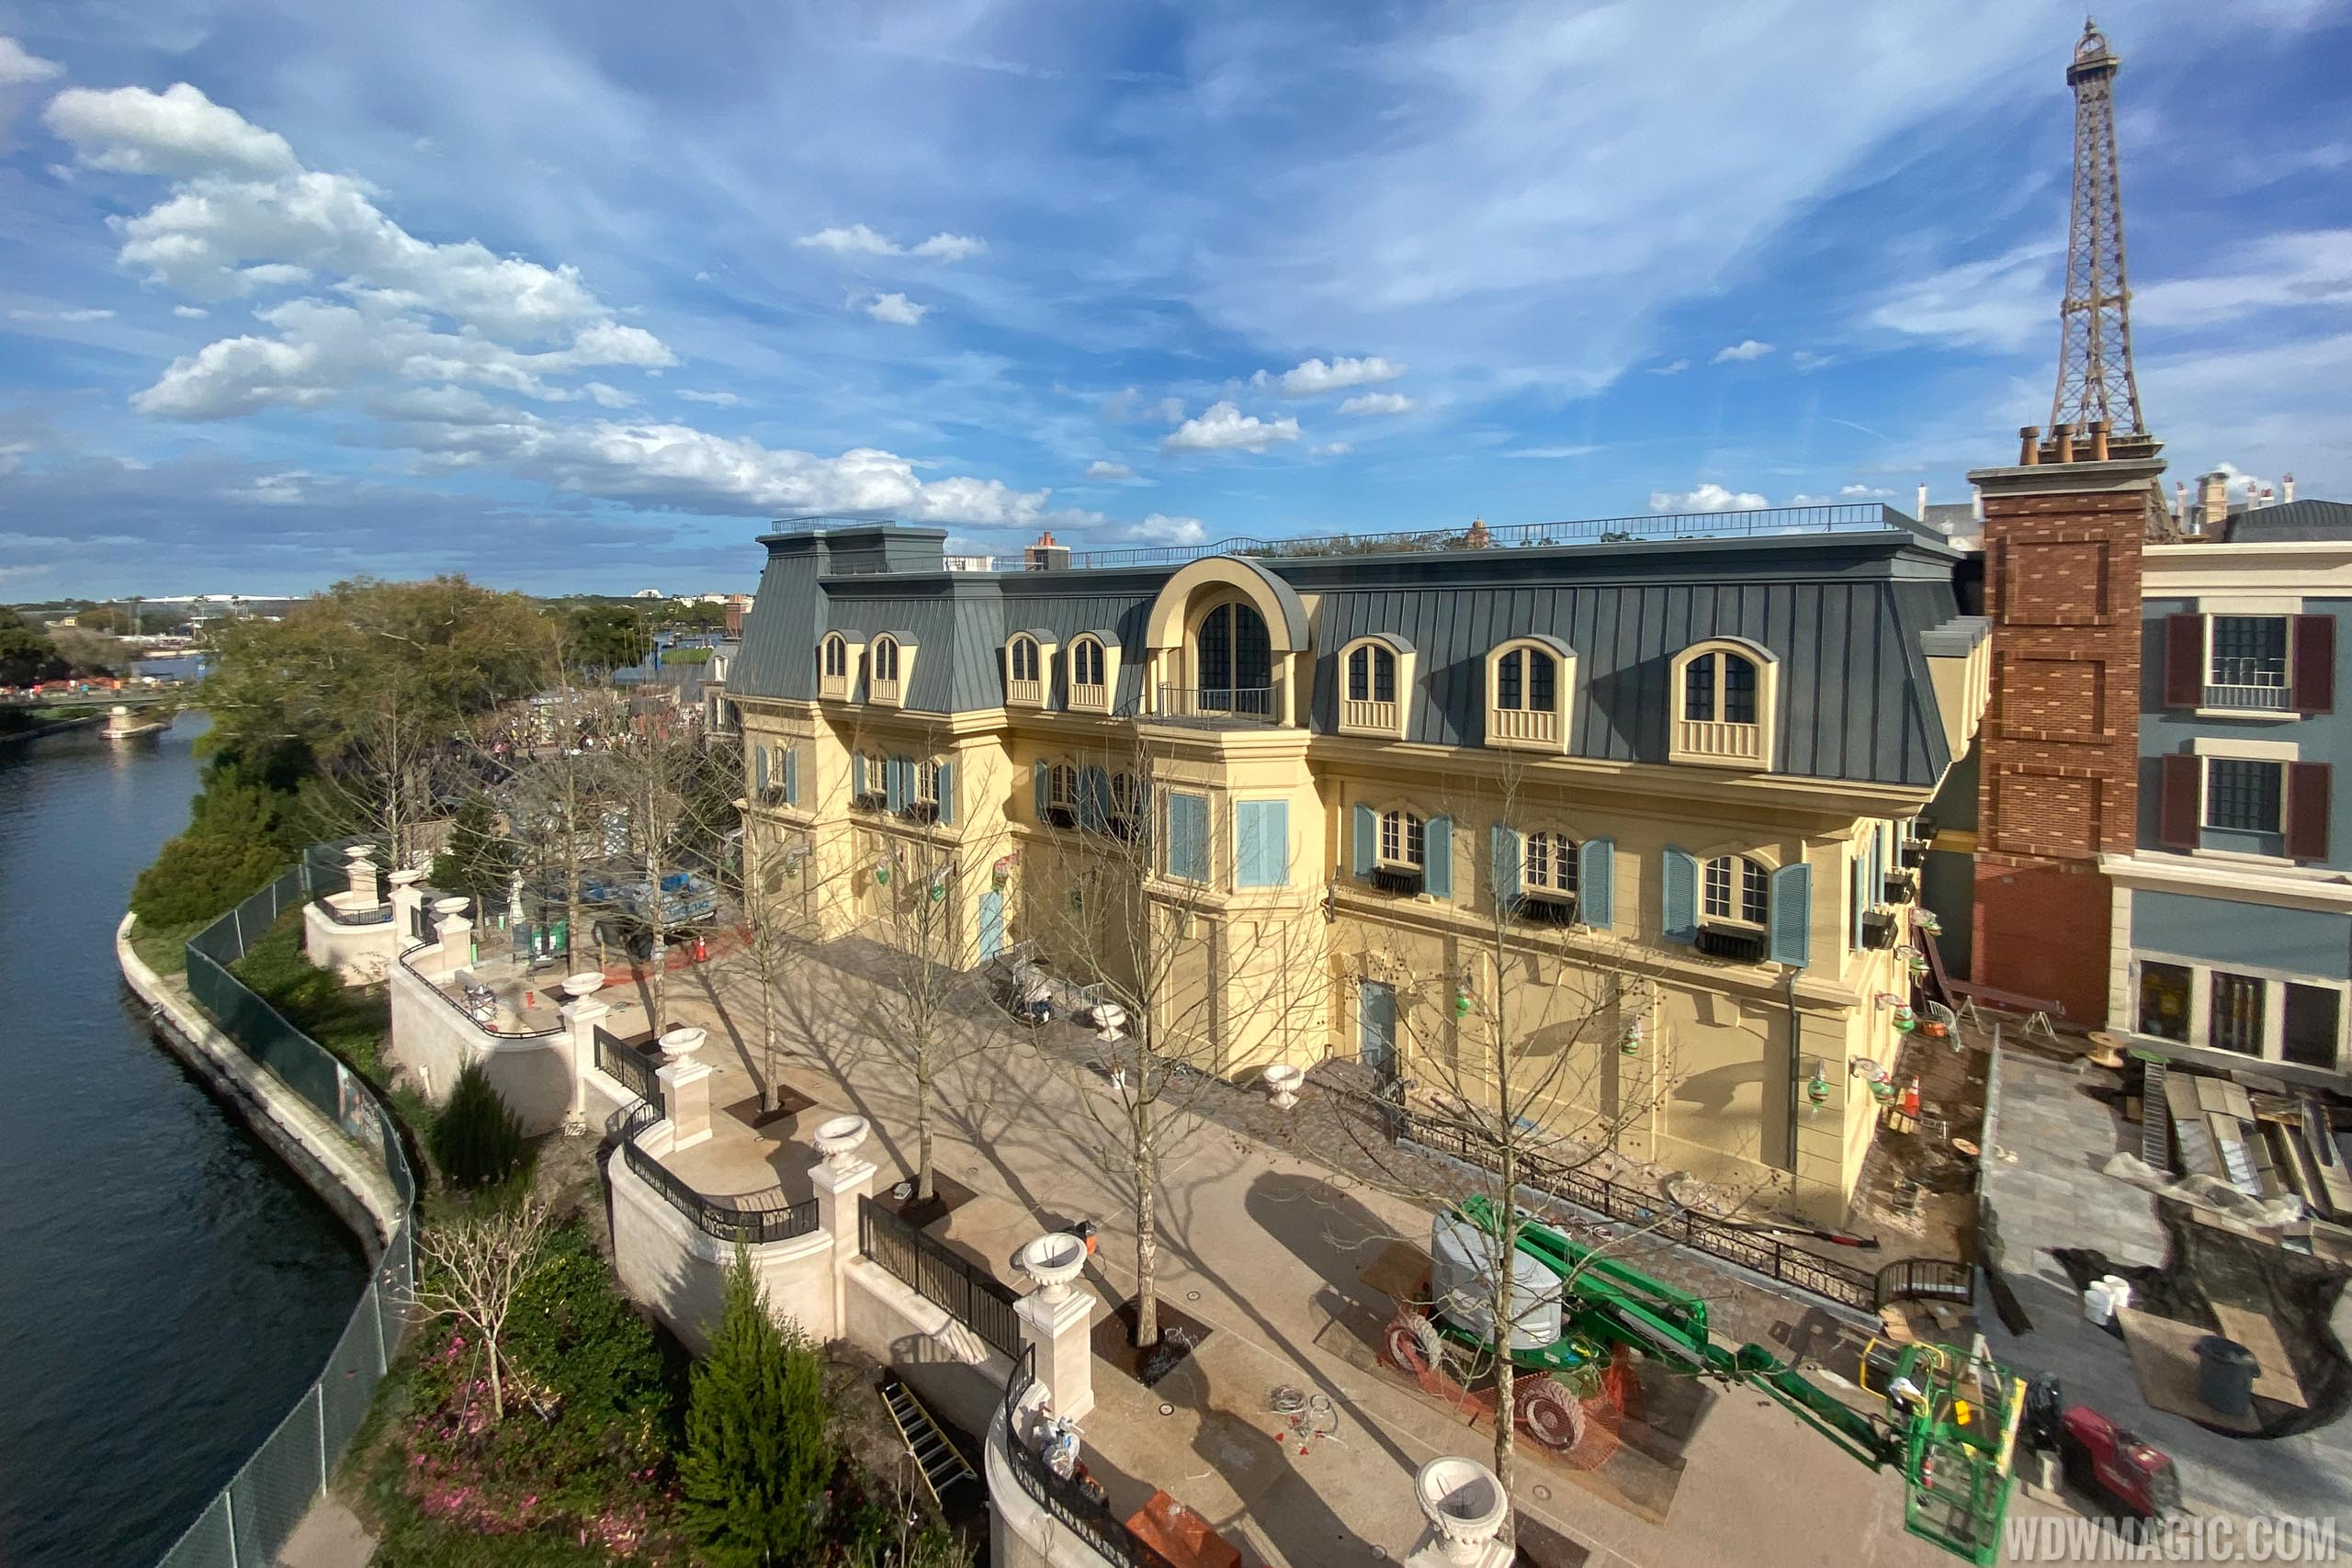 Remy's Ratatouille Adventure construction - February 23 2020